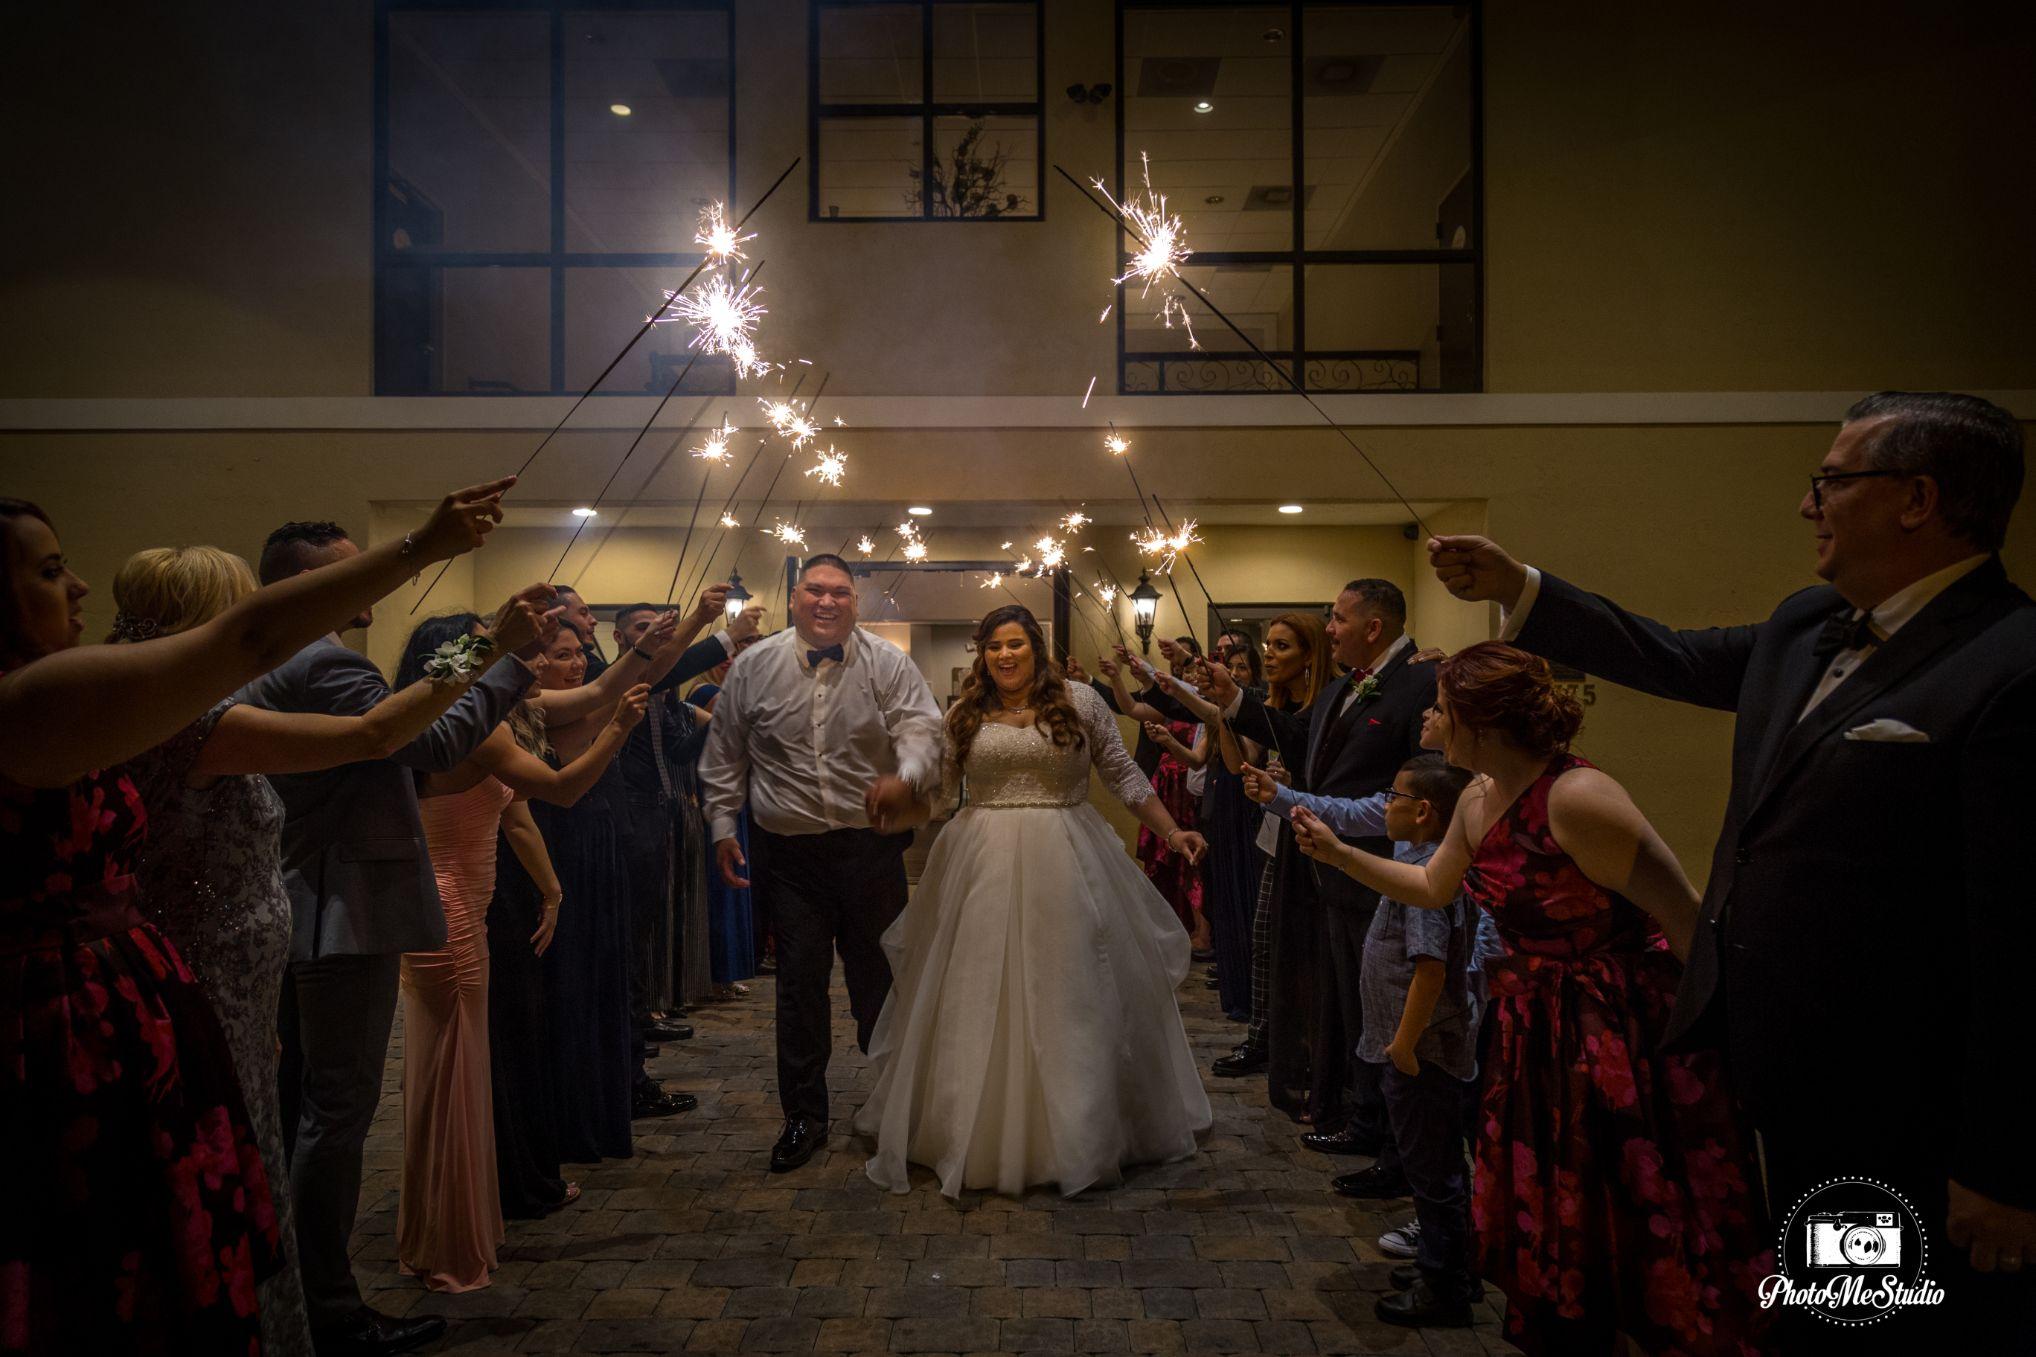 Desire wedding 1086 of 1430